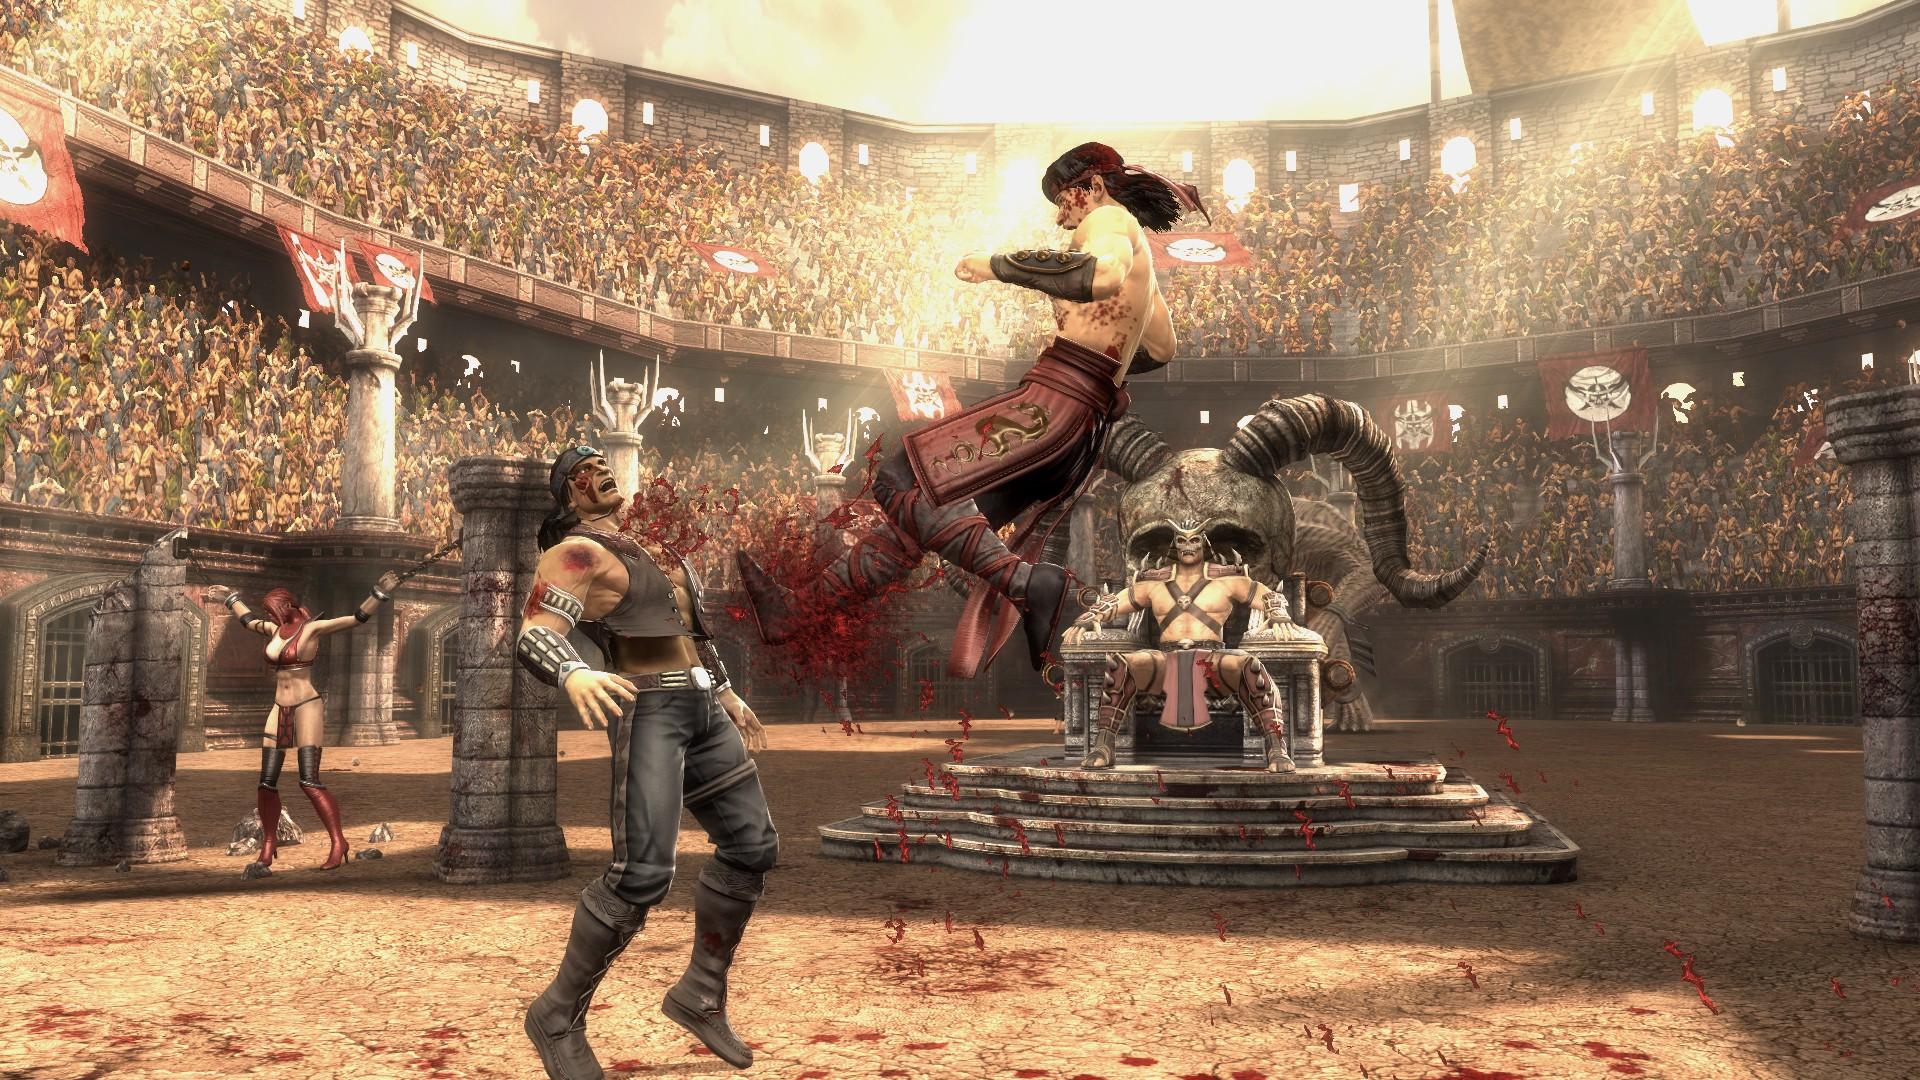 Mortal Kombat Komplete Edition free